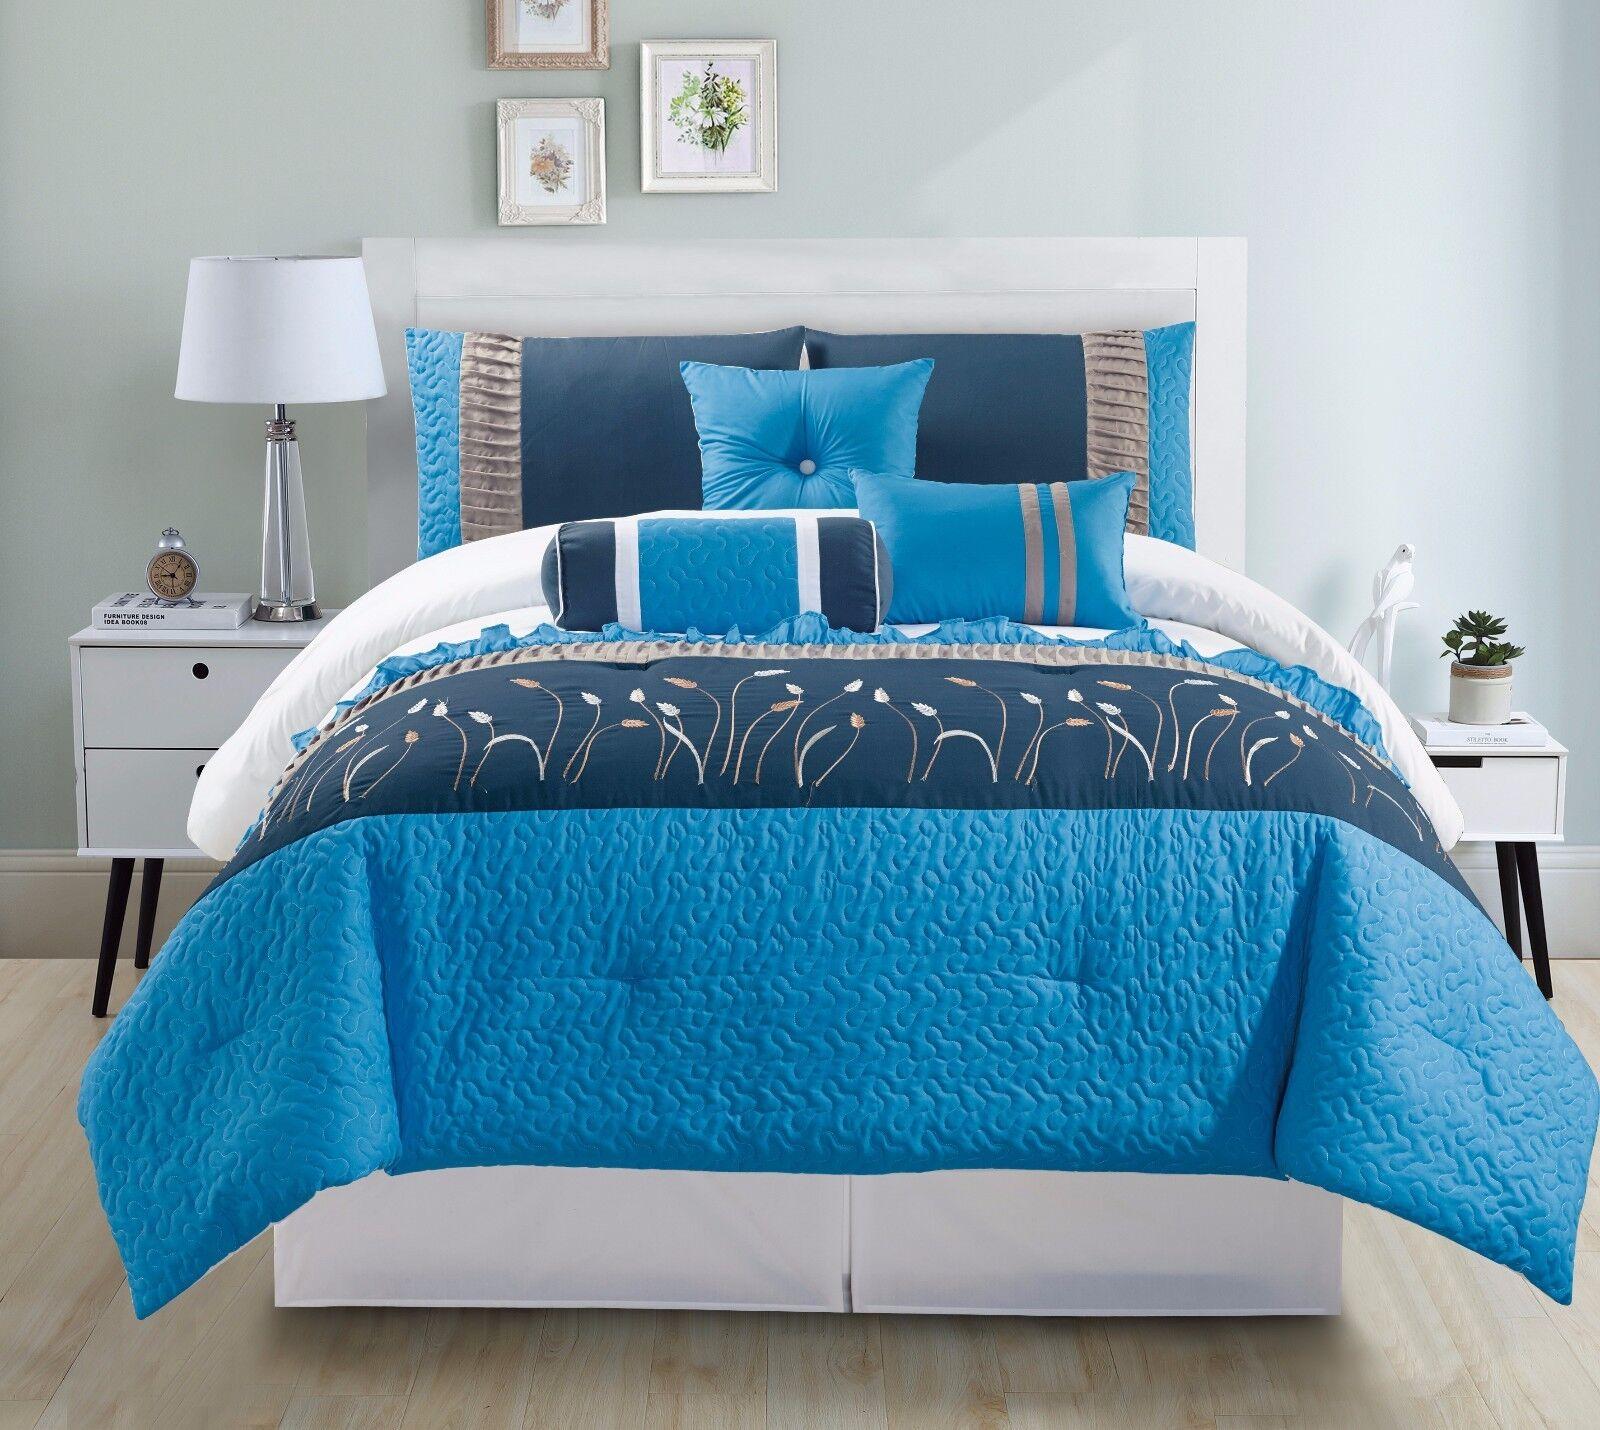 7pc Microfiber Aqua, Blau & Weiß, Striped with Embroiderot Design Comforter Set